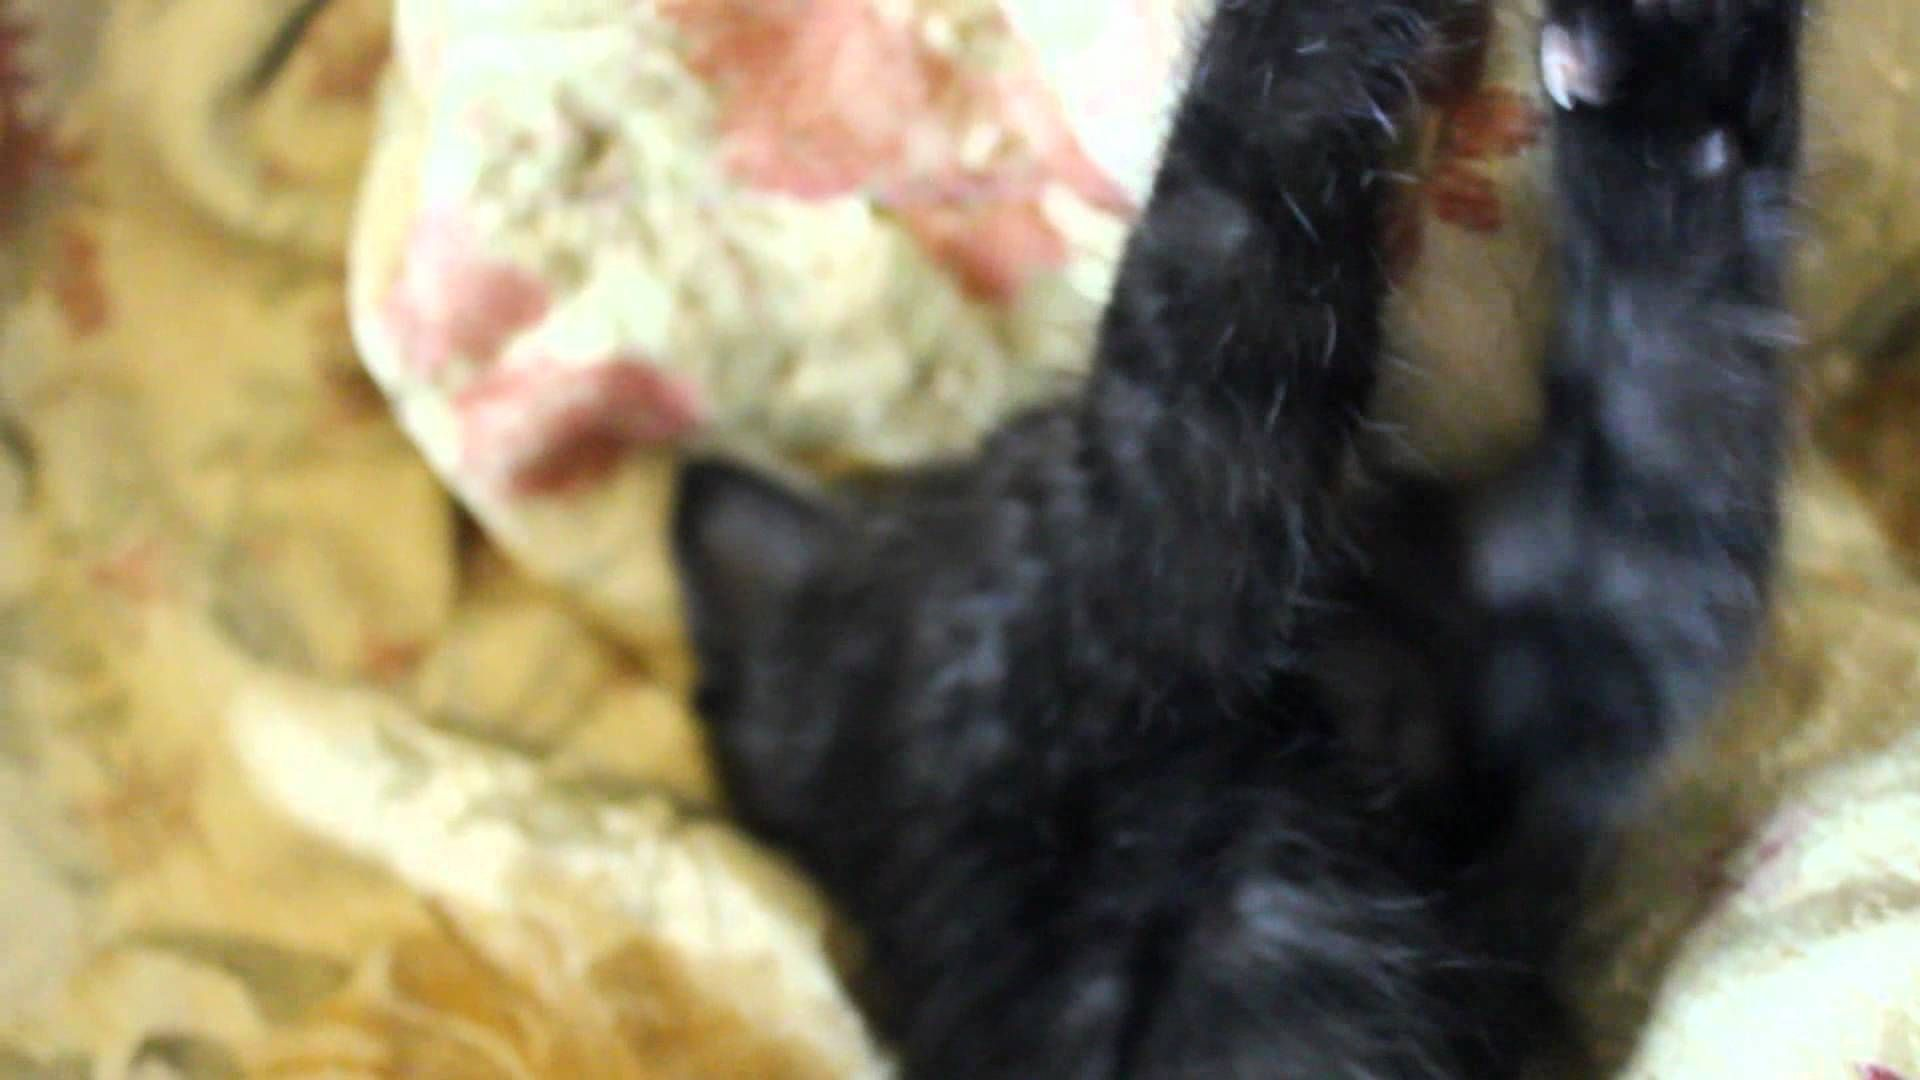 Cute Kitten Has Huge Bear Claws Kittens Cutest Black Kitten Bear Claws